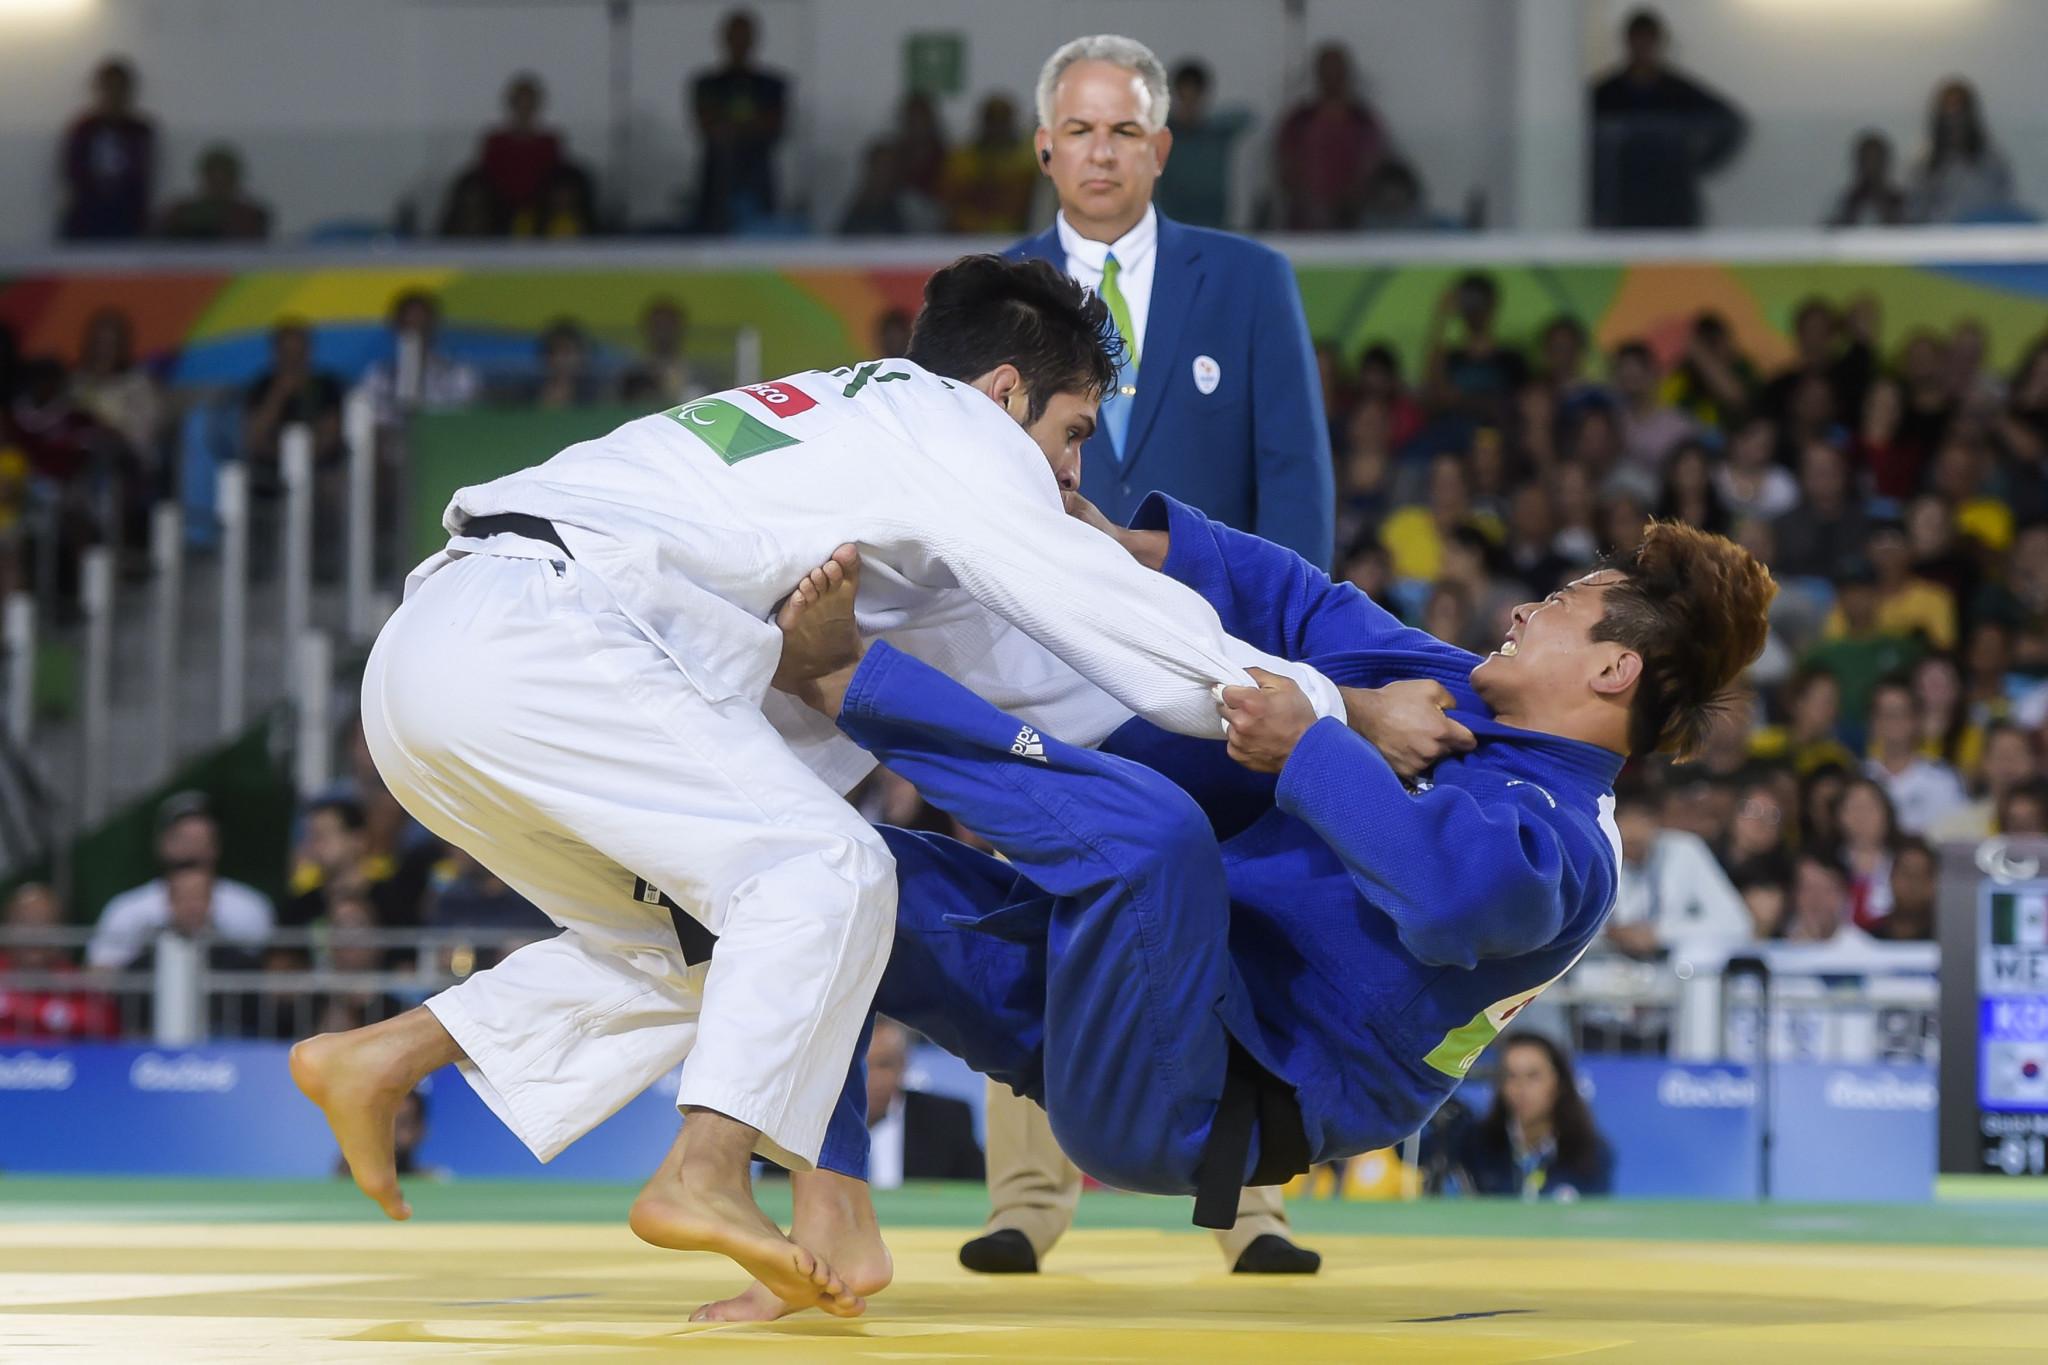 IBSA Judo Grand Prix to make long-awaited return as judokas eye Tokyo 2020 spots